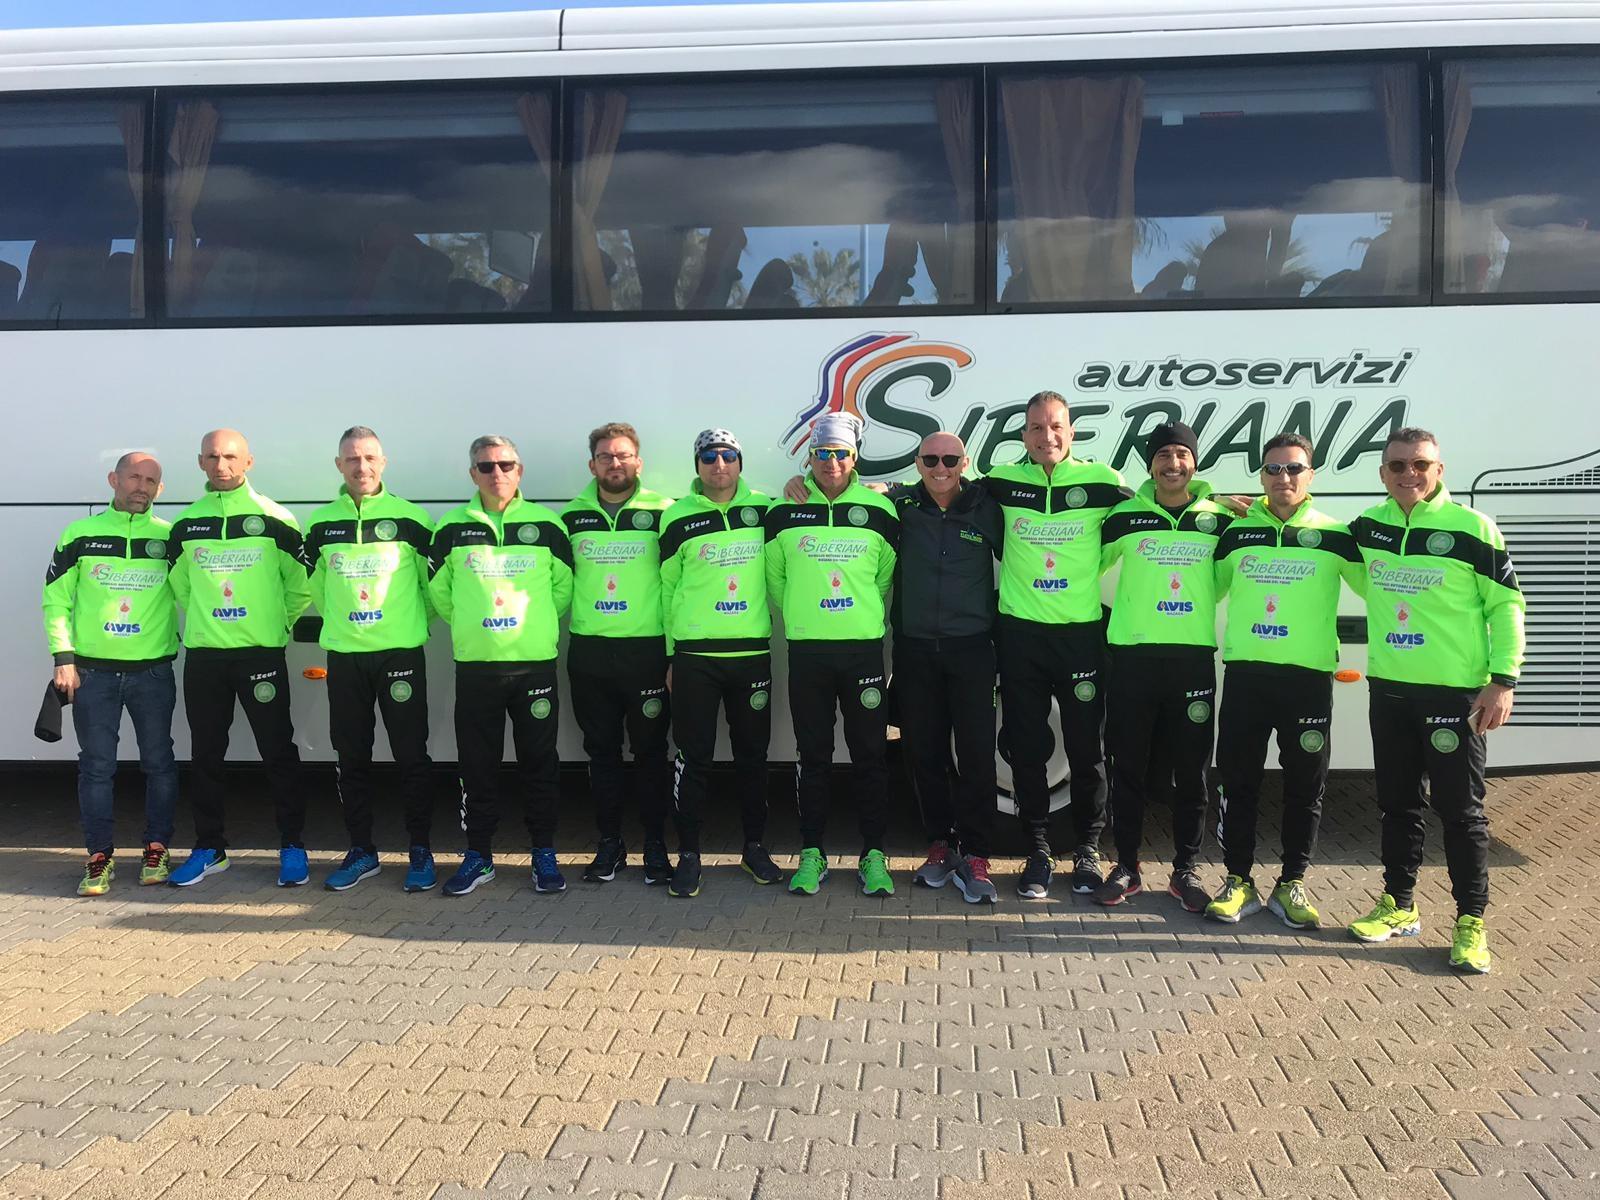 Mazara: Il team Francesco Ingargiola alla 16° Mezza Maratona di Agrigento